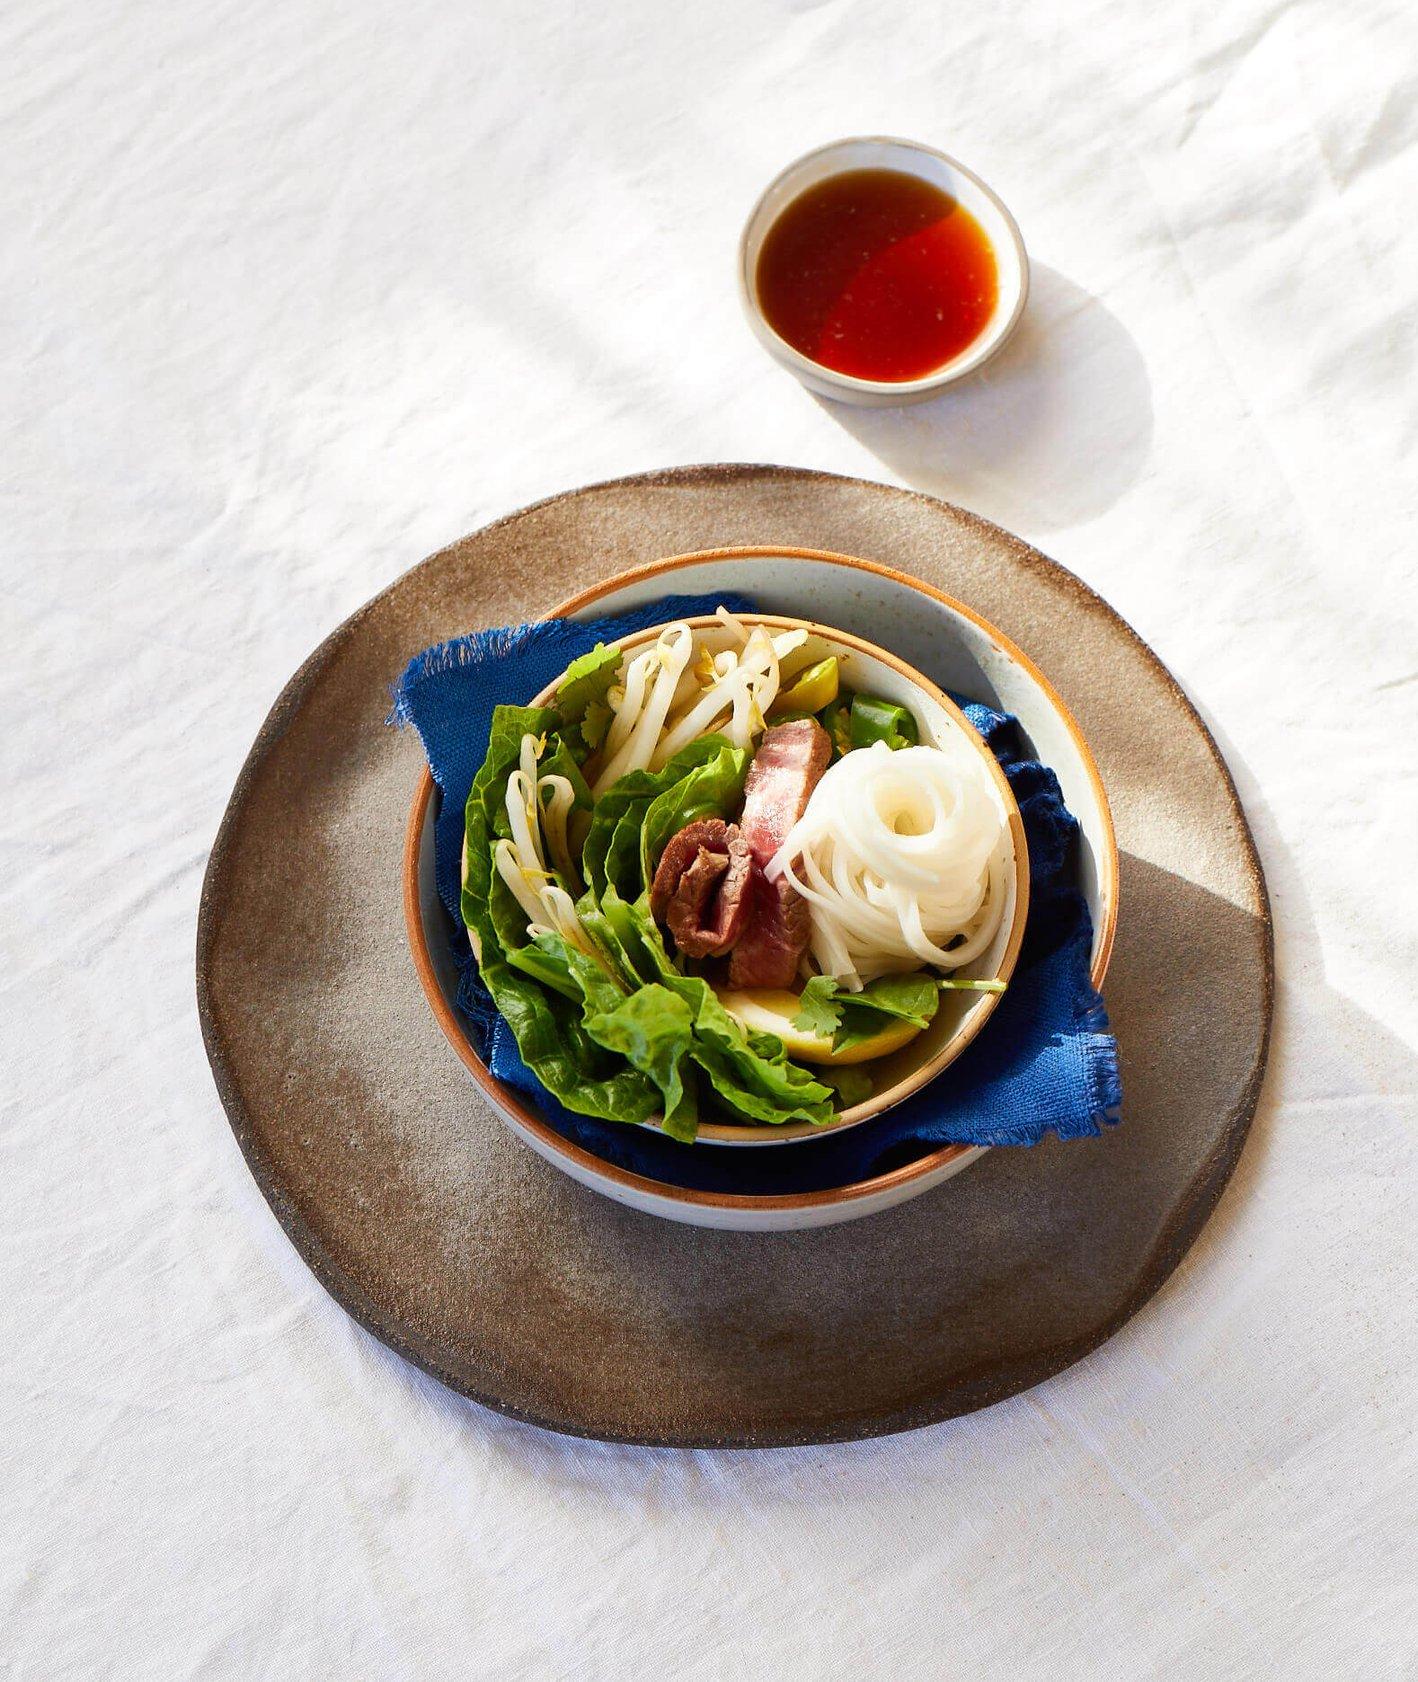 bun bo nam bo, sałatka bun bo nam bo, kuchnia azjatycka, makaron ryżowy, prosta sałatka, lekka sałatka, sałatka z makaronem